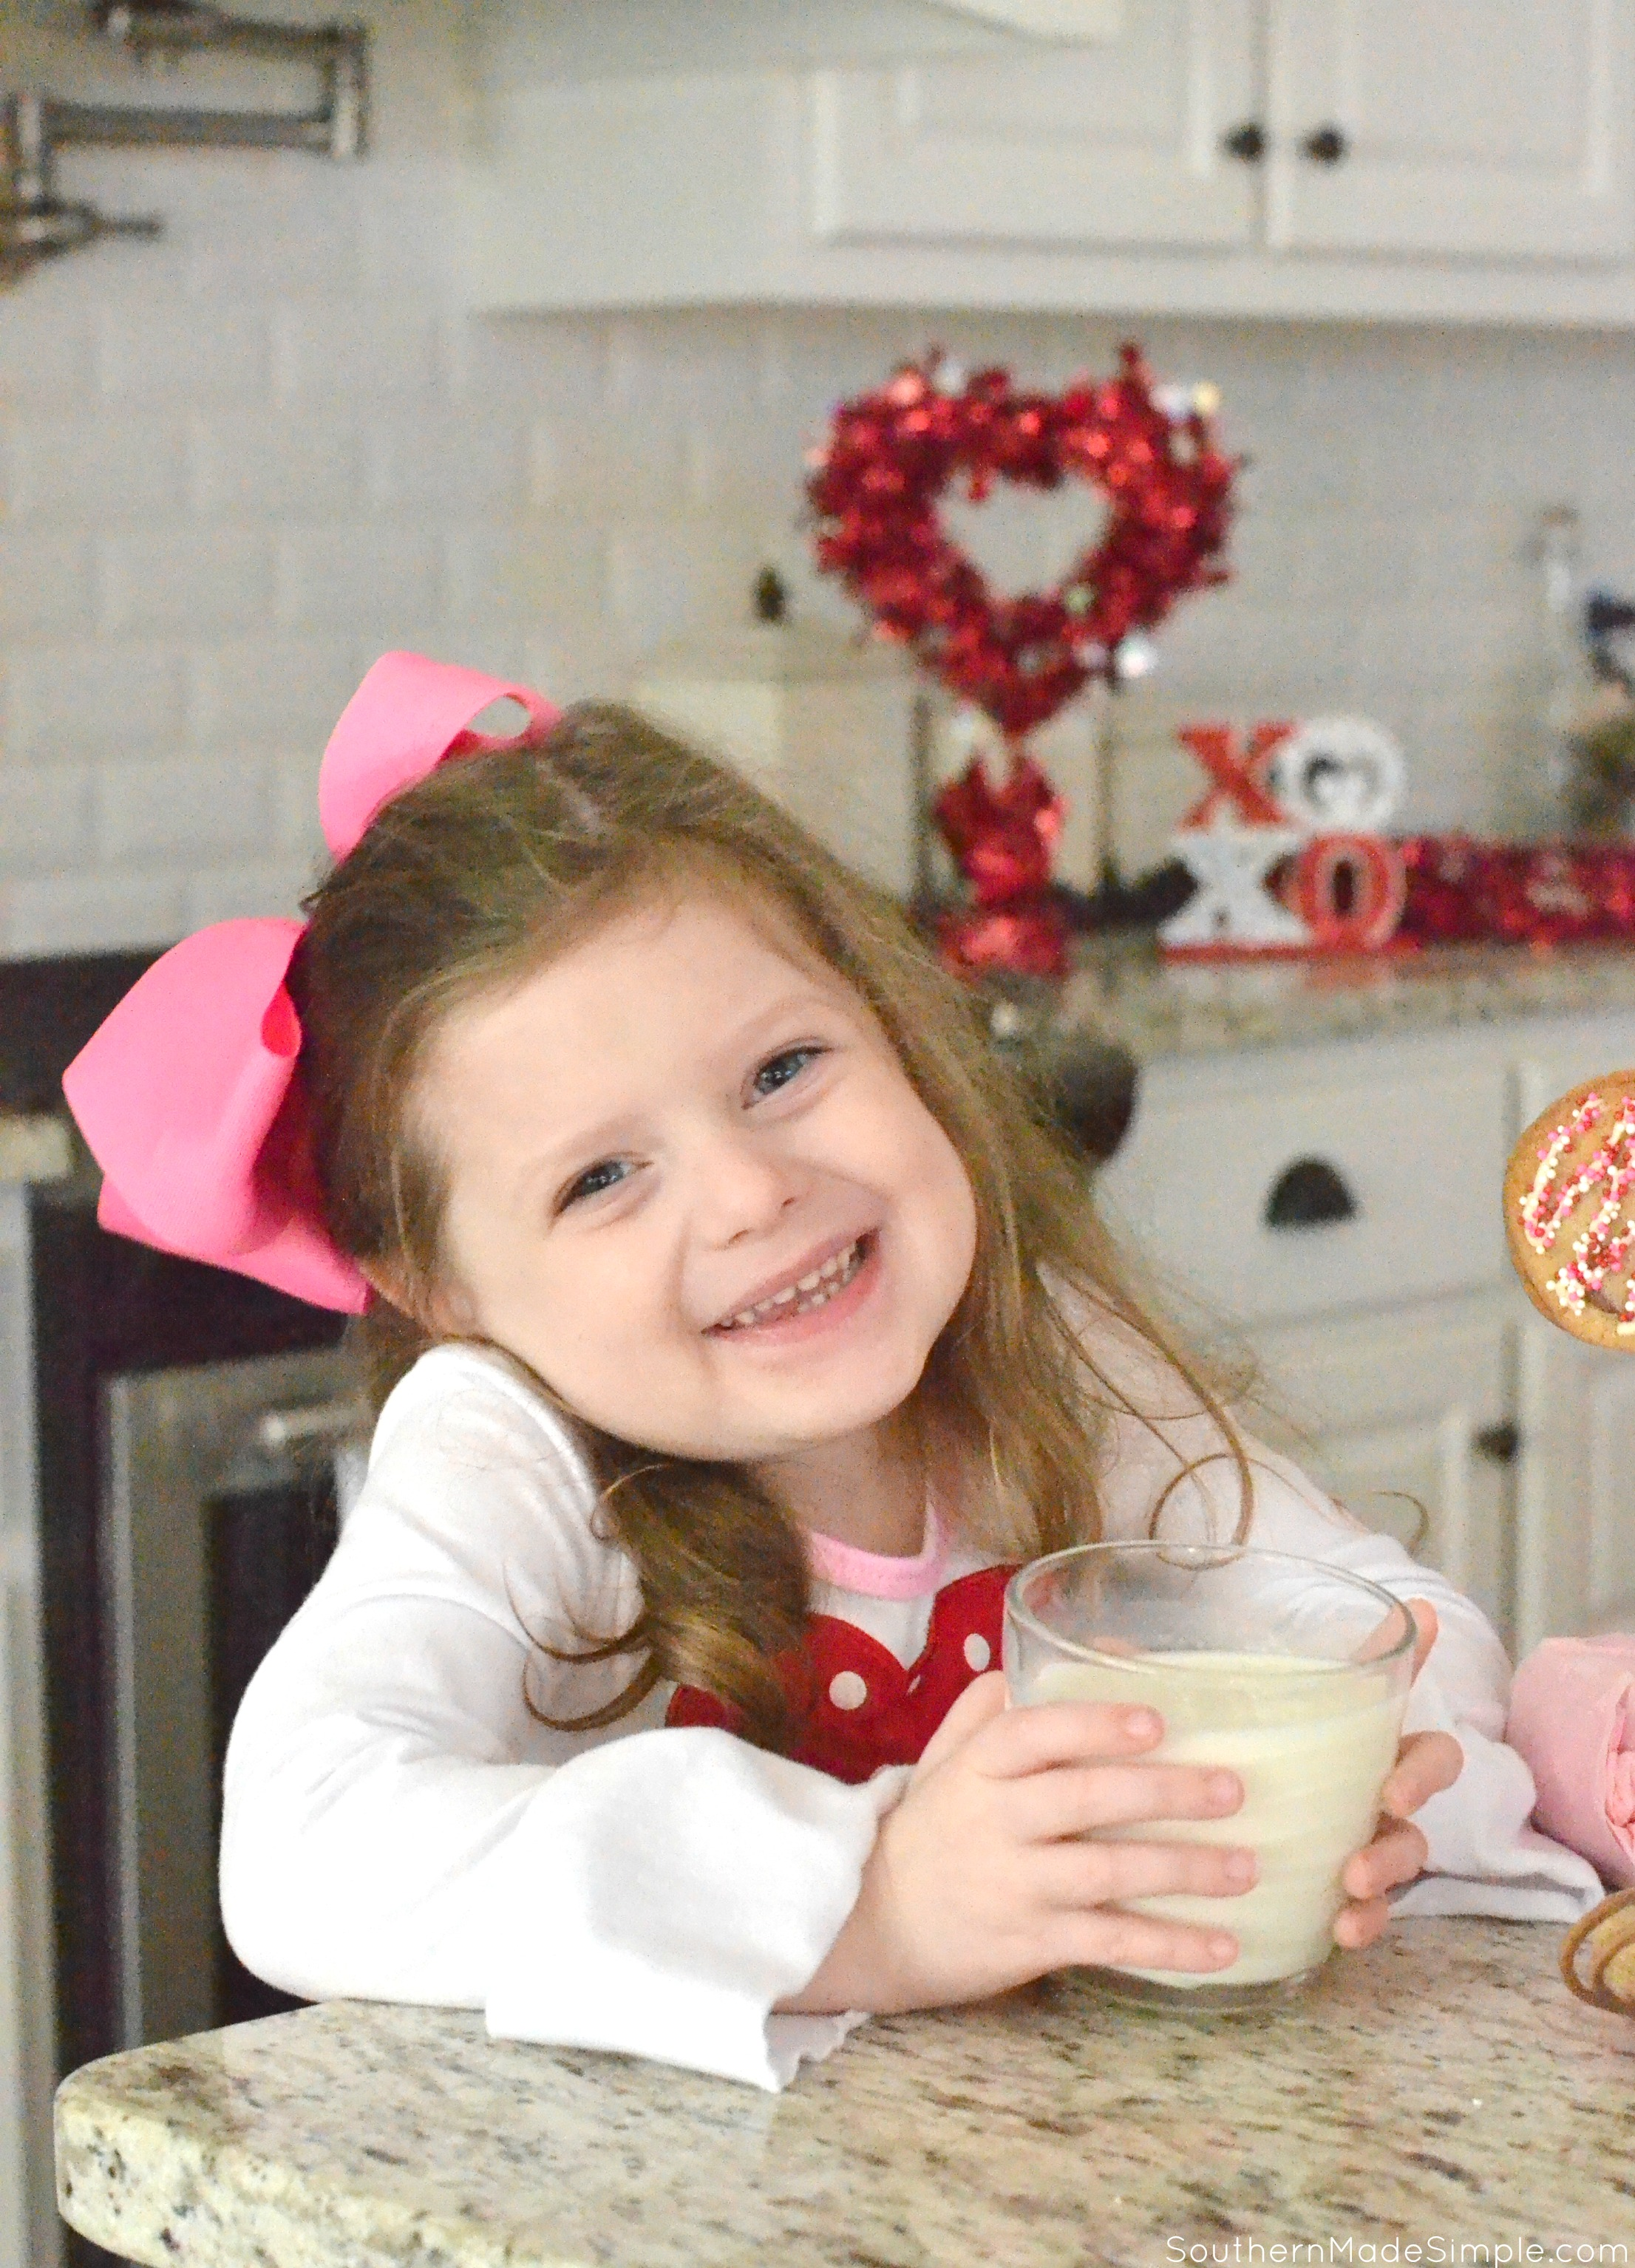 We Go Together Like Milk & Cookies - DIY Chocolate Chip Cookie Pops